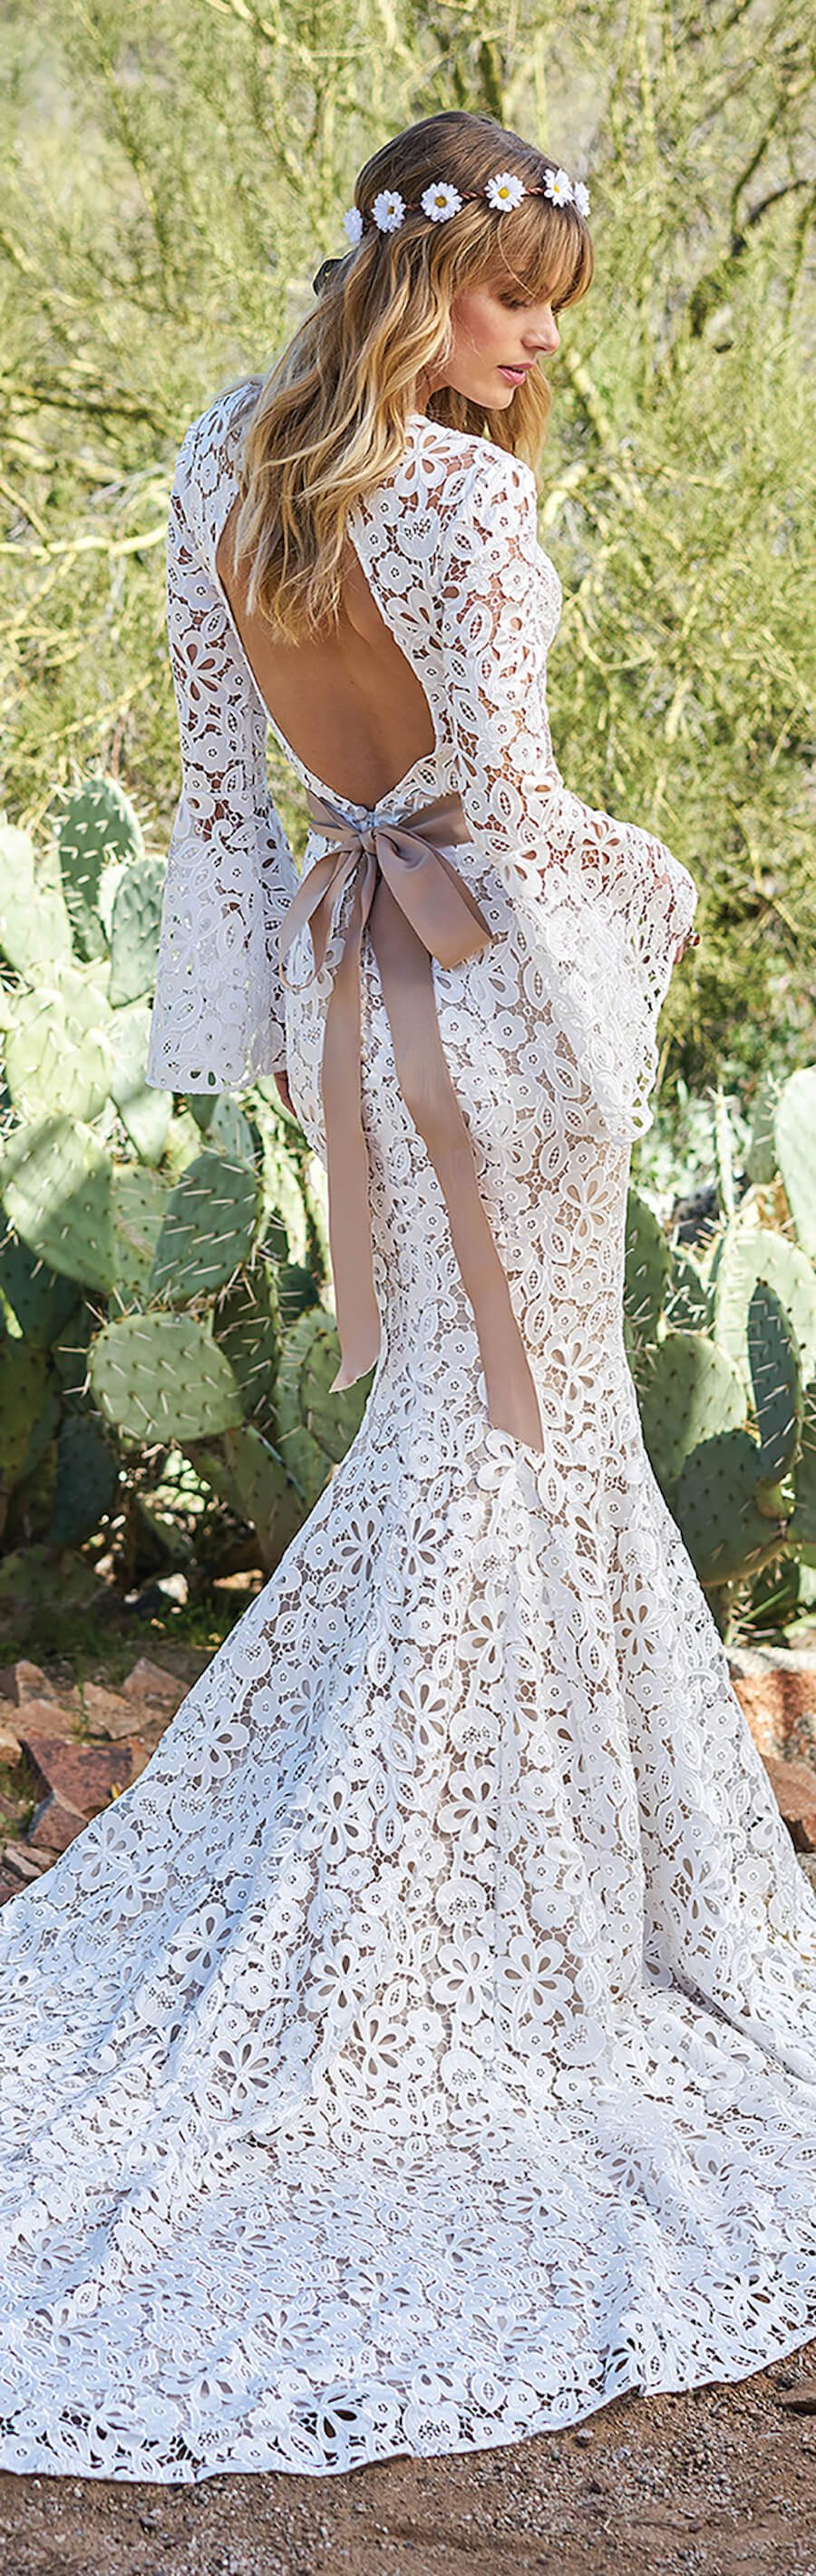 Lillian west wedding dress collection spring lillian west